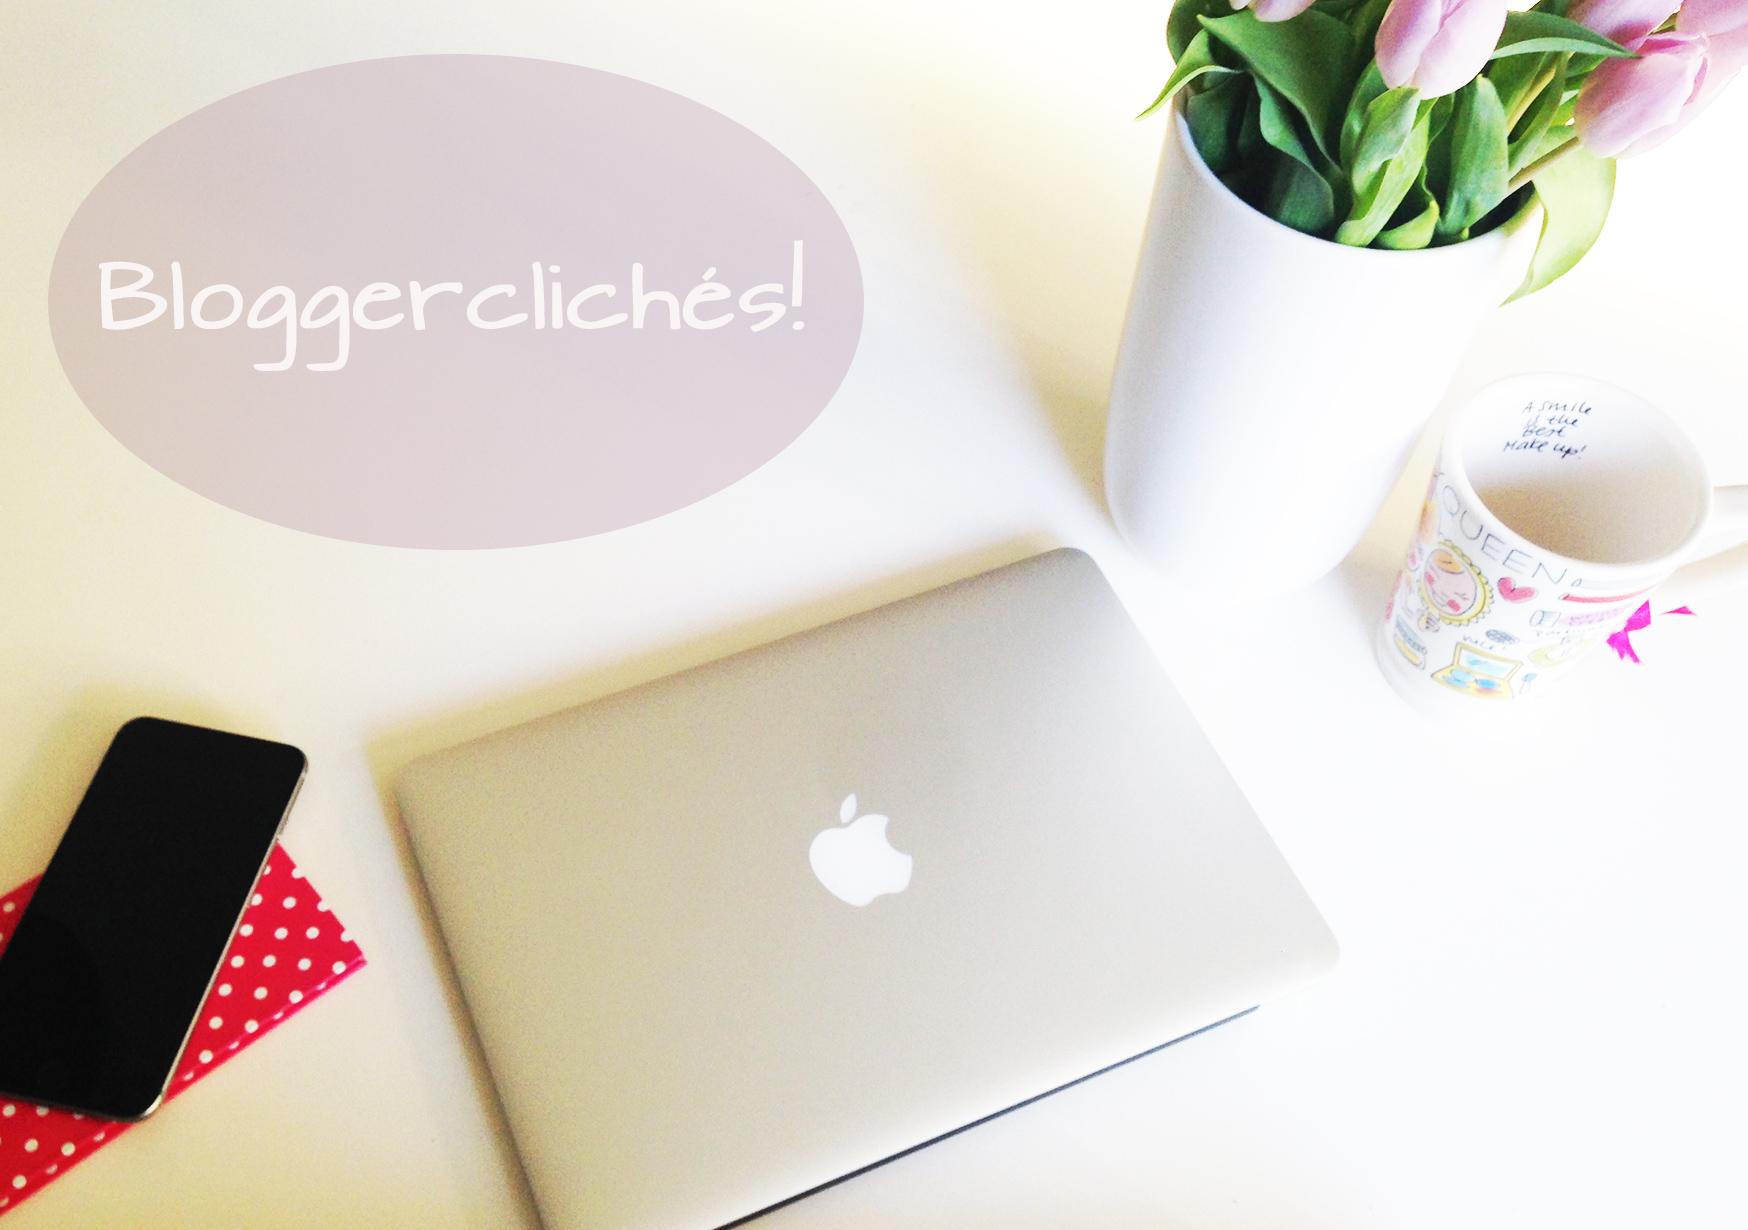 Bloggerclichés!